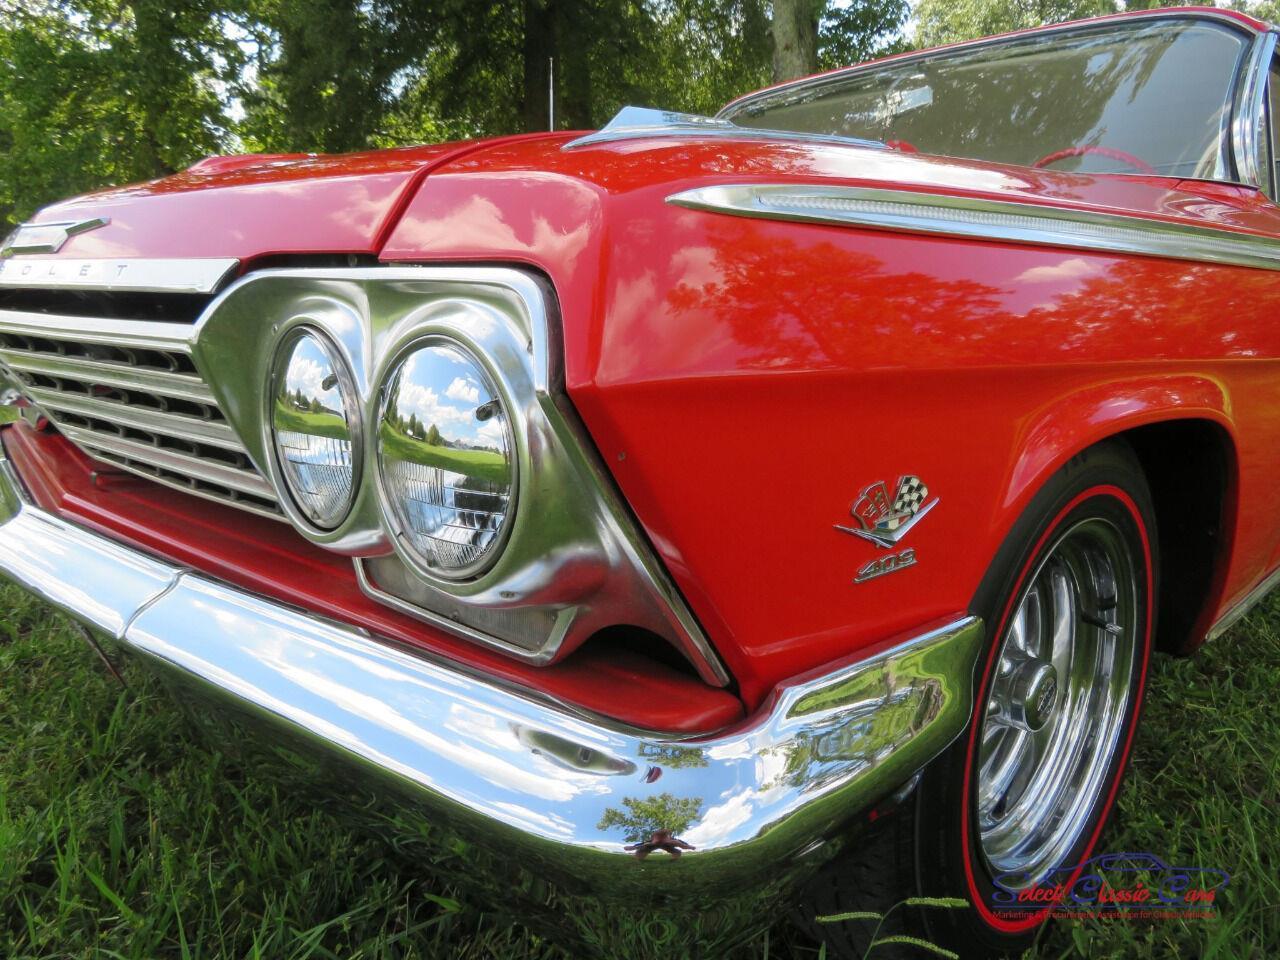 1962 Chevrolet Impala (CC-1389714) for sale in Hiram, Georgia